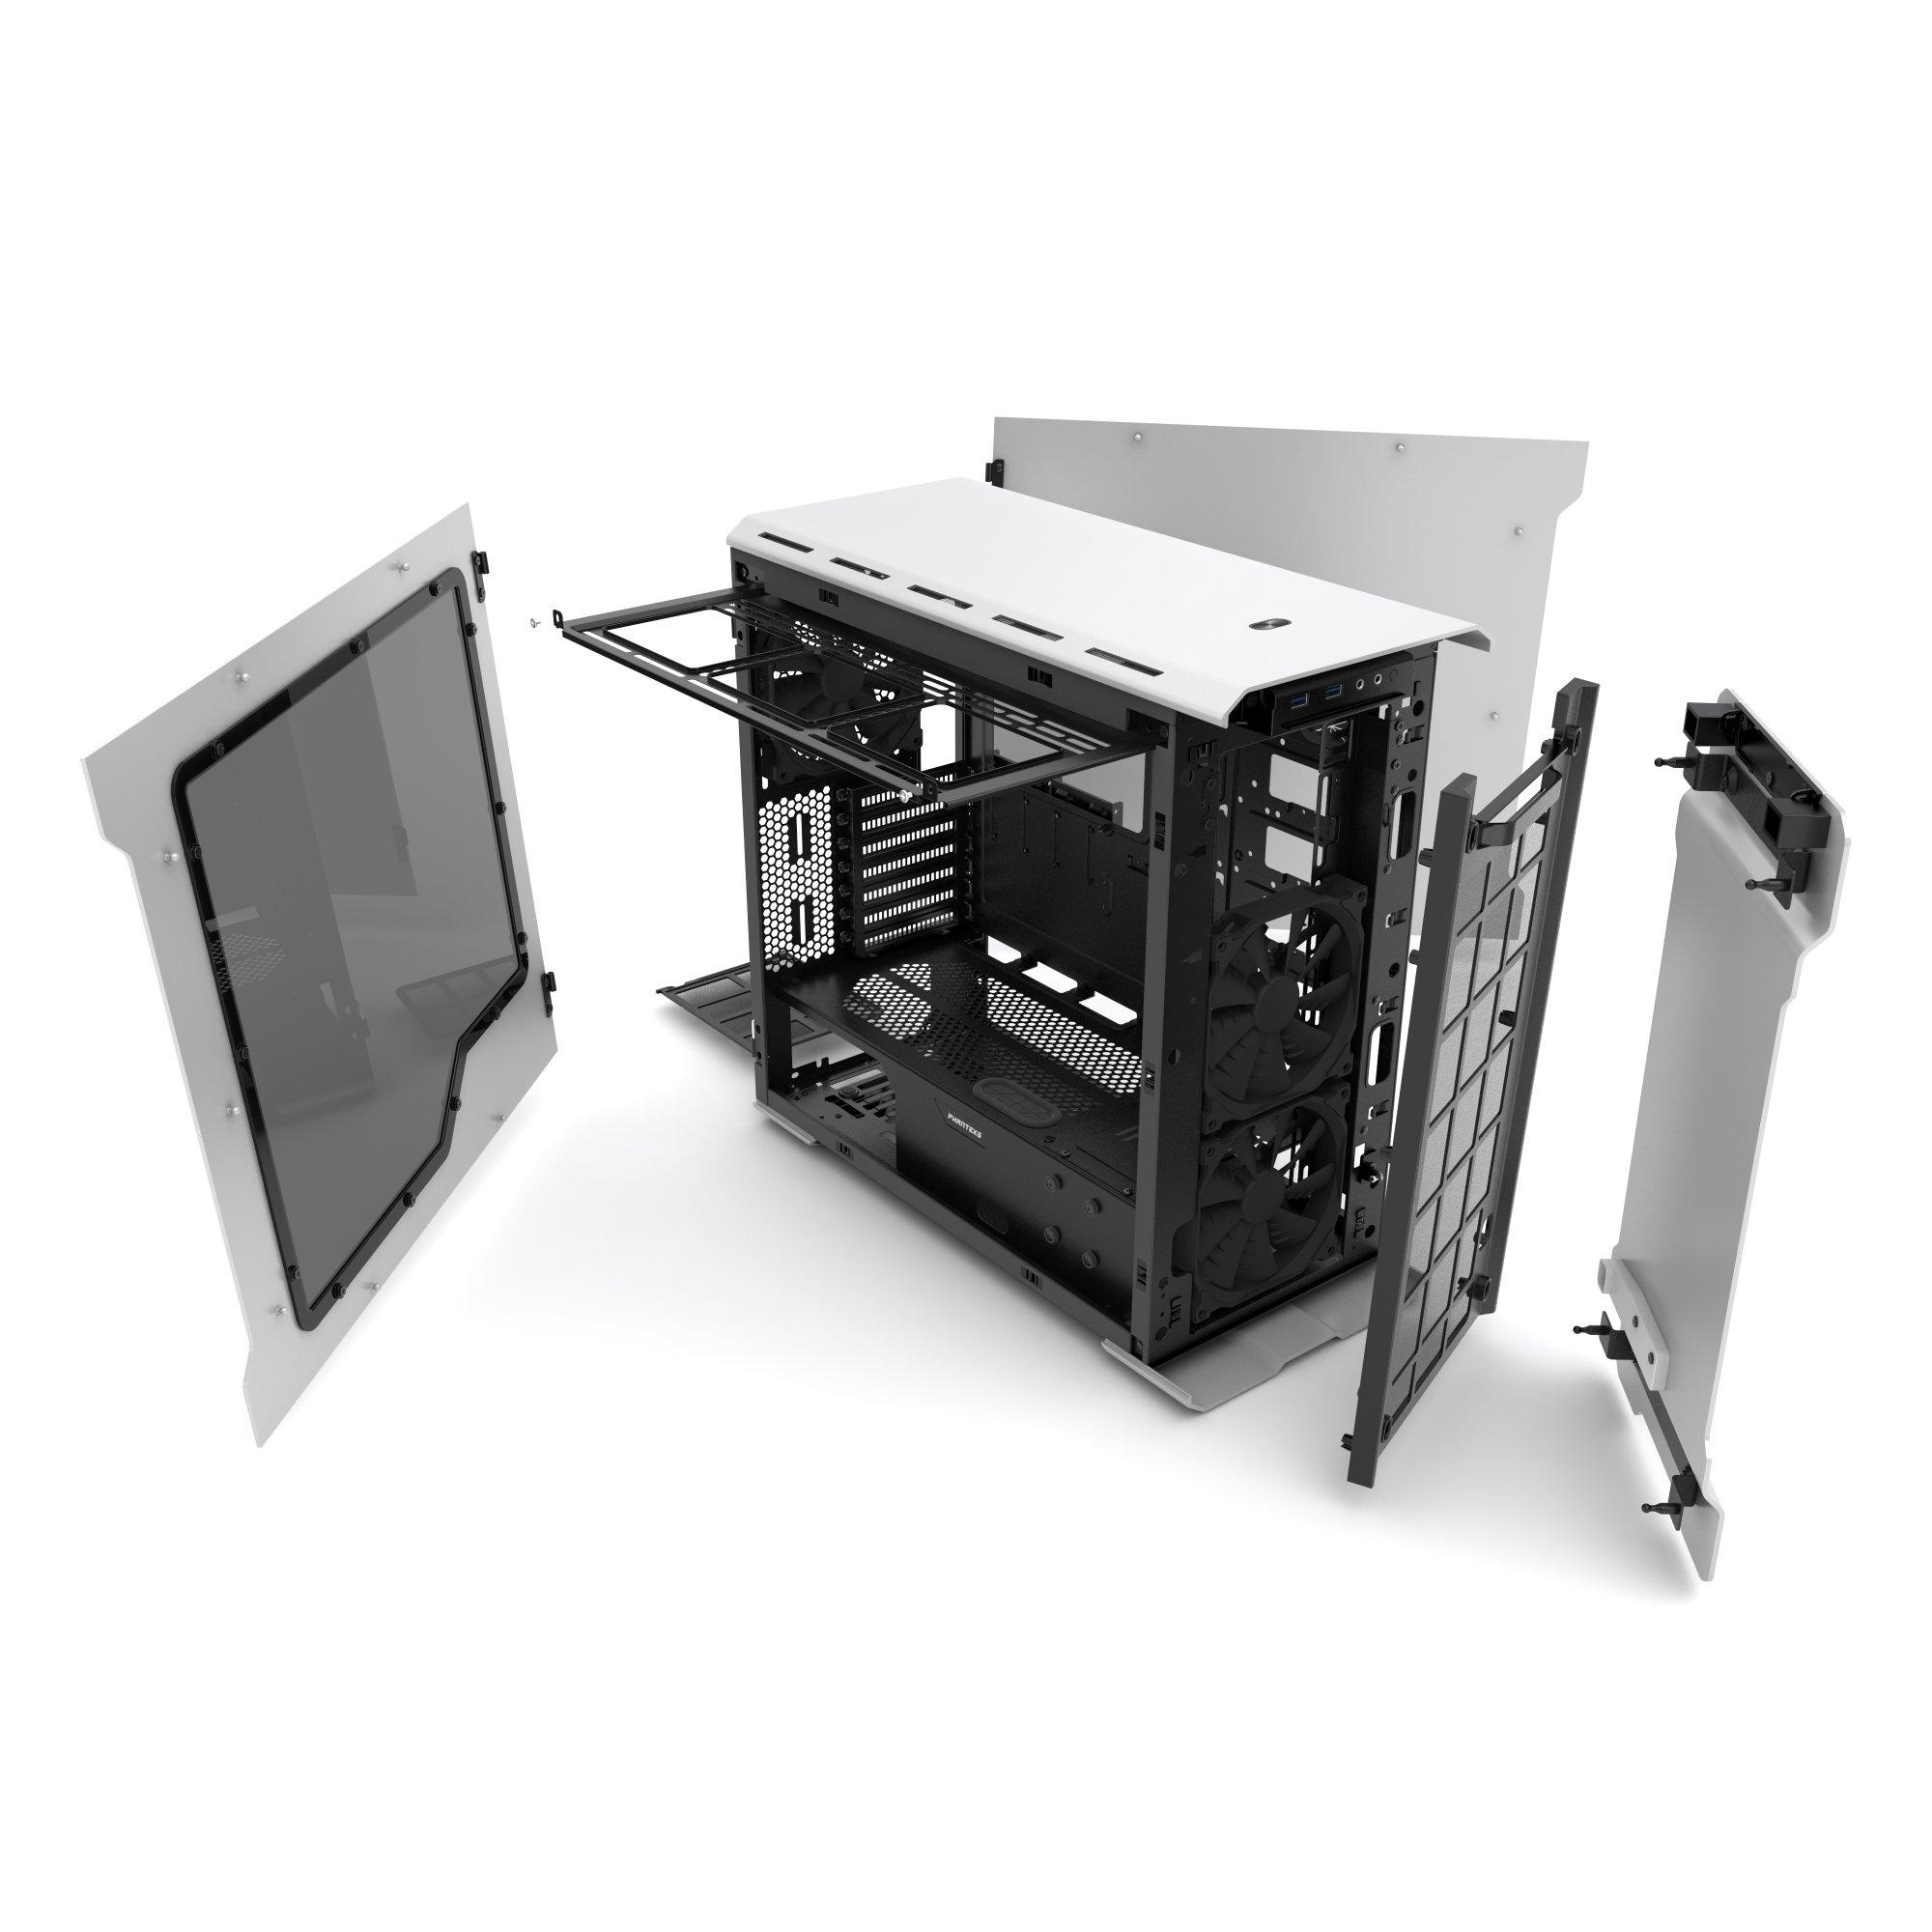 Phanteks Enthoo Evolv ATX Alum/Steel Tower Computer Case, Window (PH-ES515E_GS) Galaxy Silver by Phanteks (Image #3)